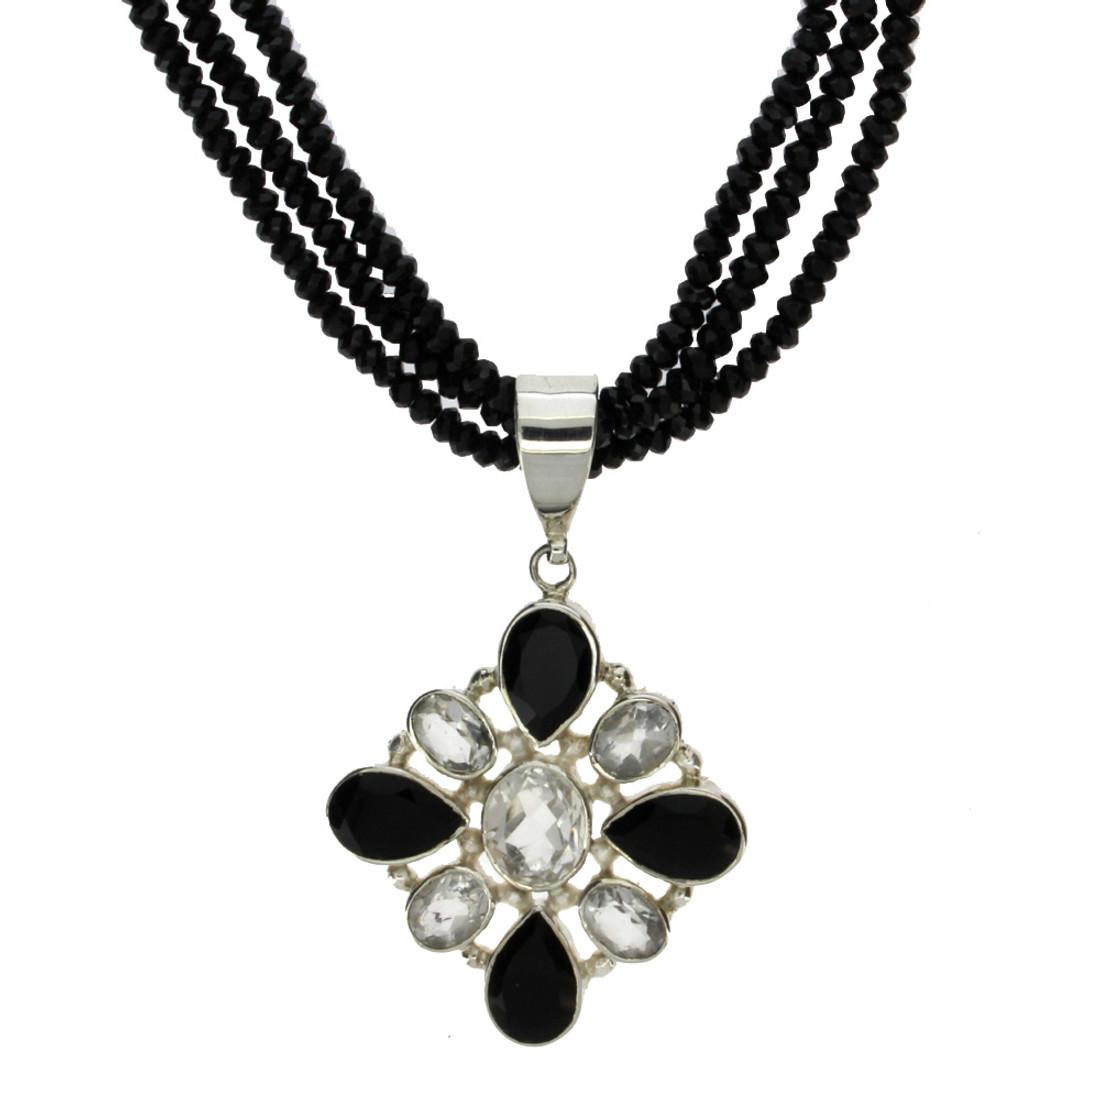 Black Onyx and clear Quartz necklace.